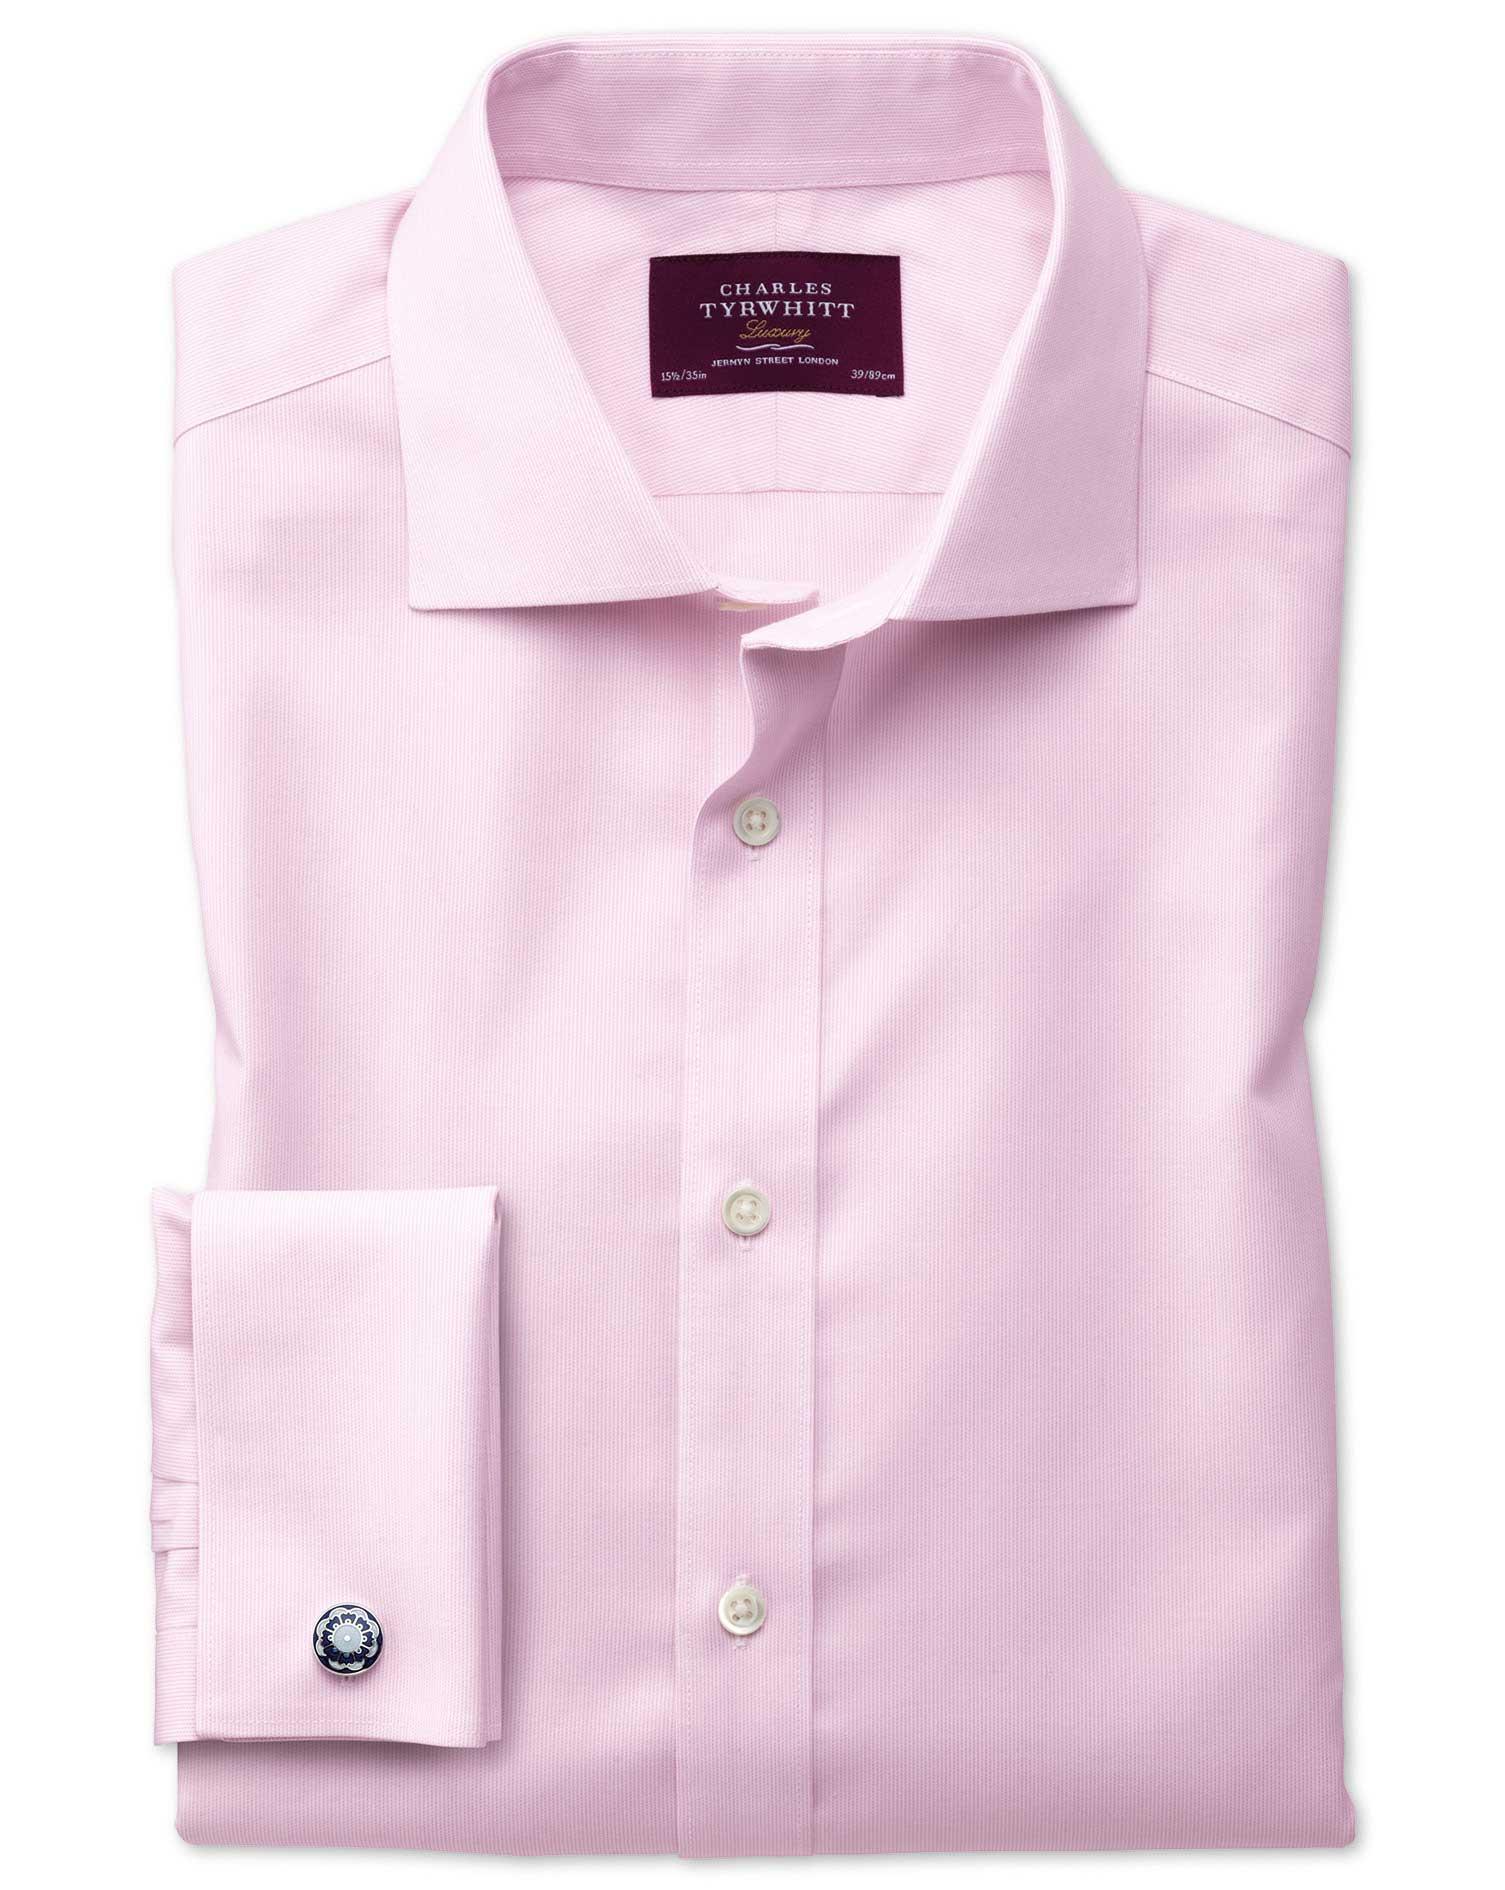 Extra Slim Fit Semi-Cutaway Non-Iron Luxury Hairline Stripe Pink Cotton Formal Shirt Double Cuff Siz